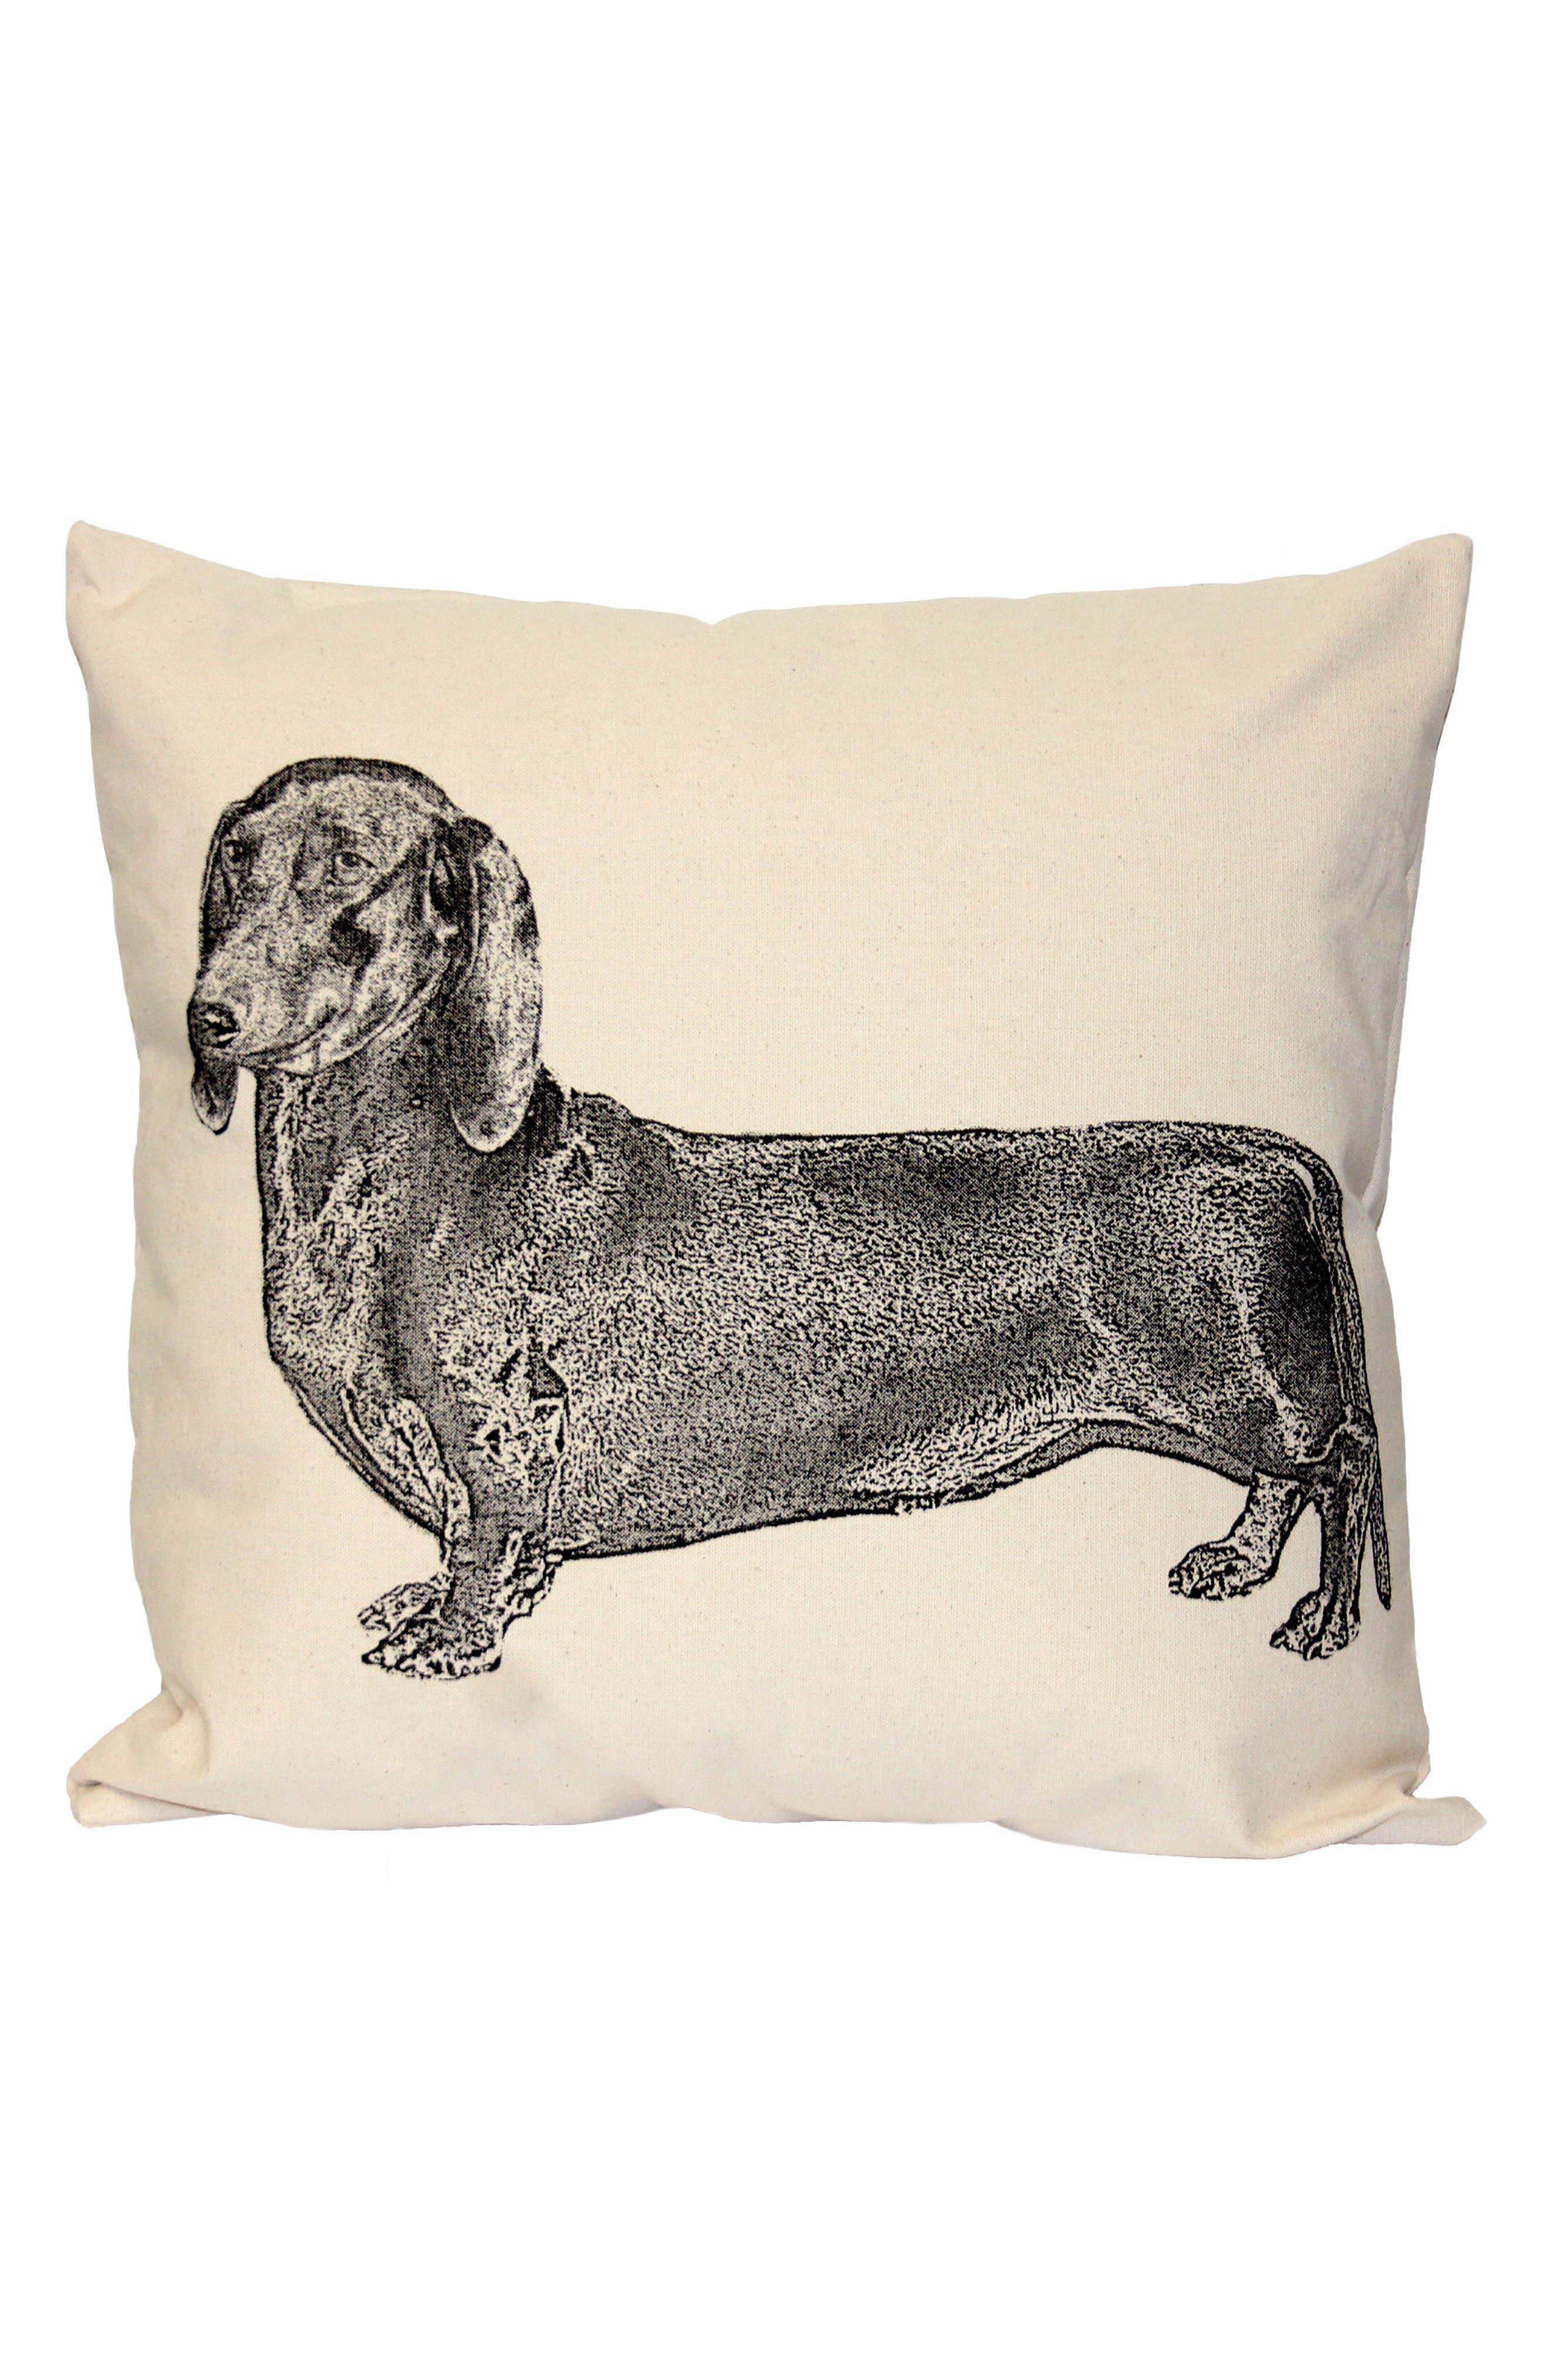 Animal Accent Pillow,                             Main thumbnail 17, color,